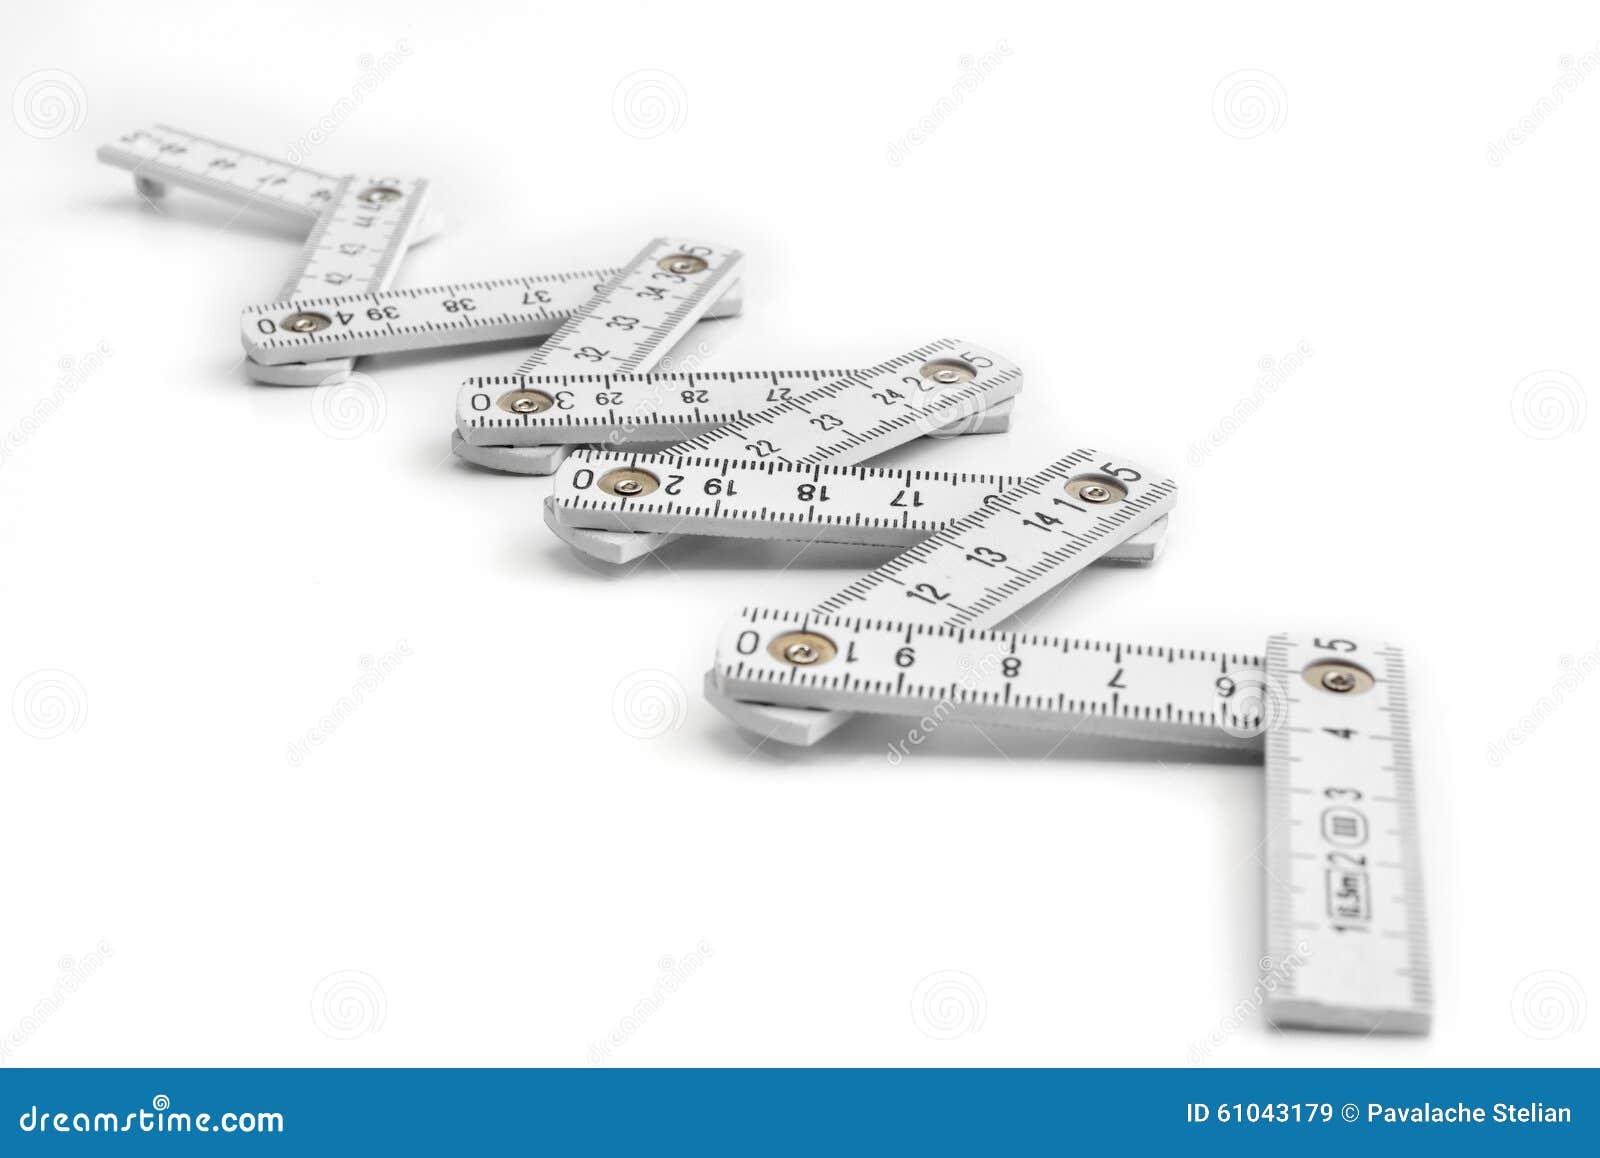 Ruler ( Yardstick ) For Measurements Suggesting A Positive ...